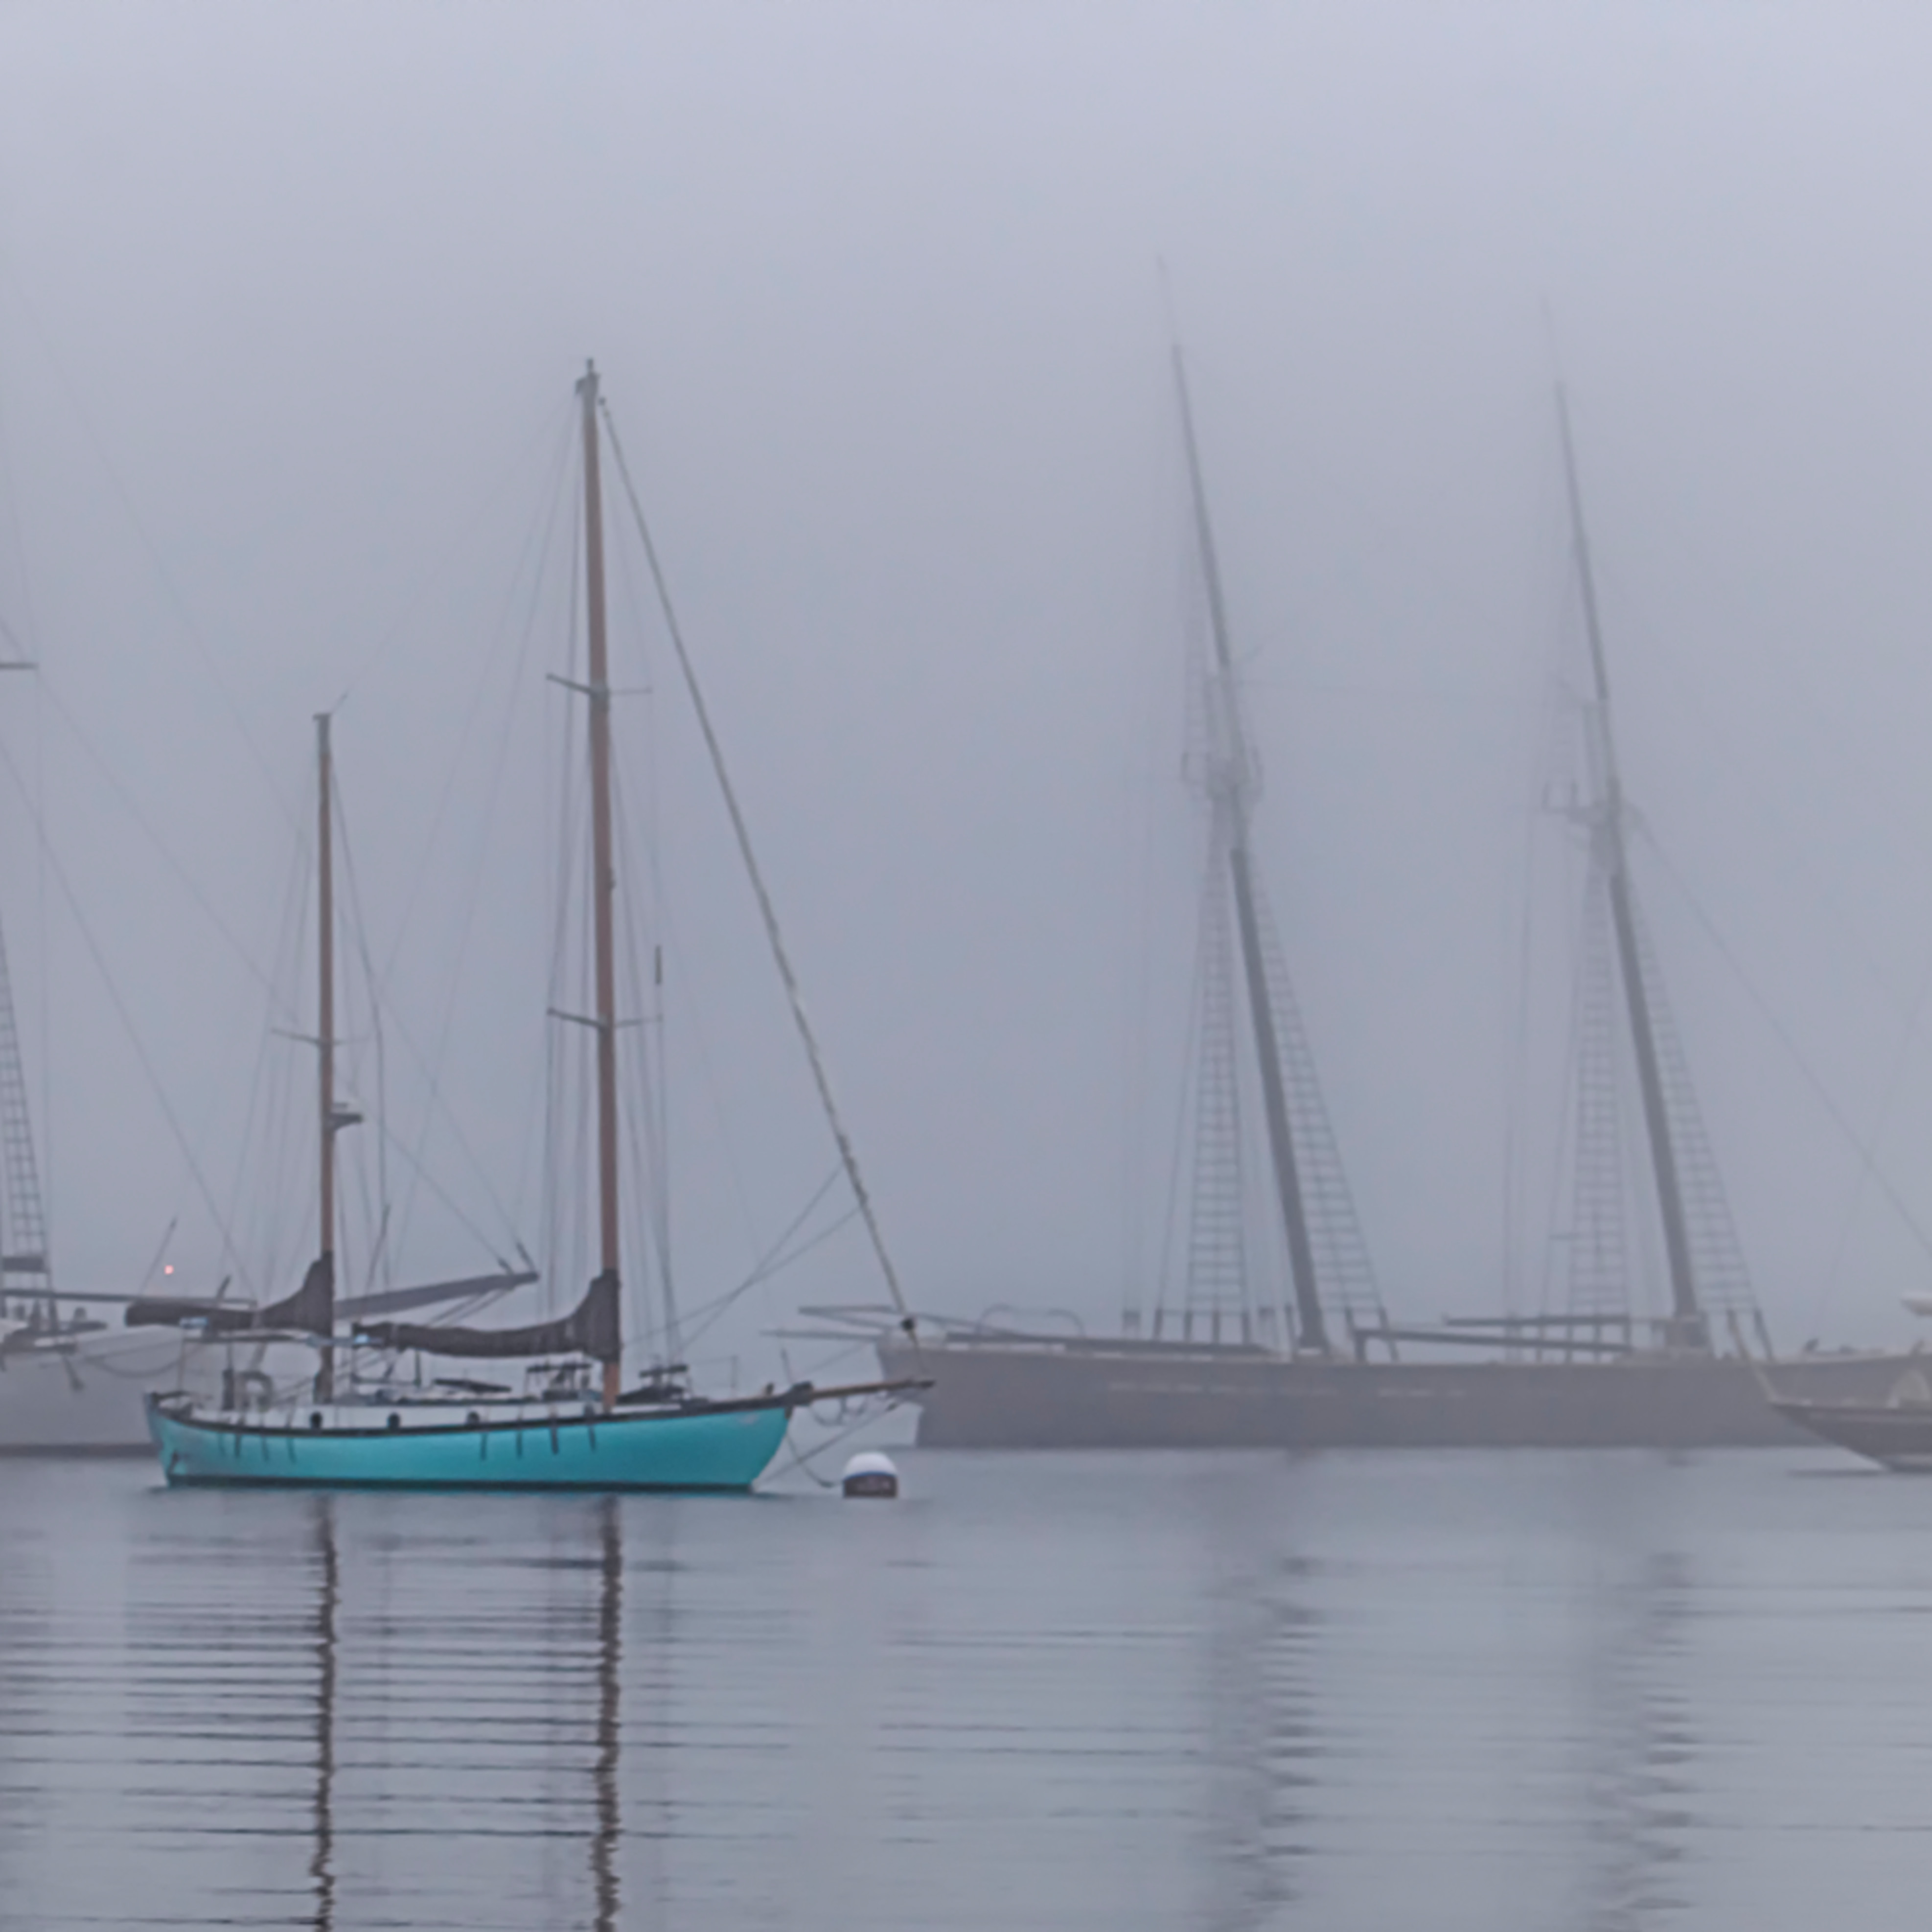 Vineyard haven harbor turquoise sail boat j6ccon